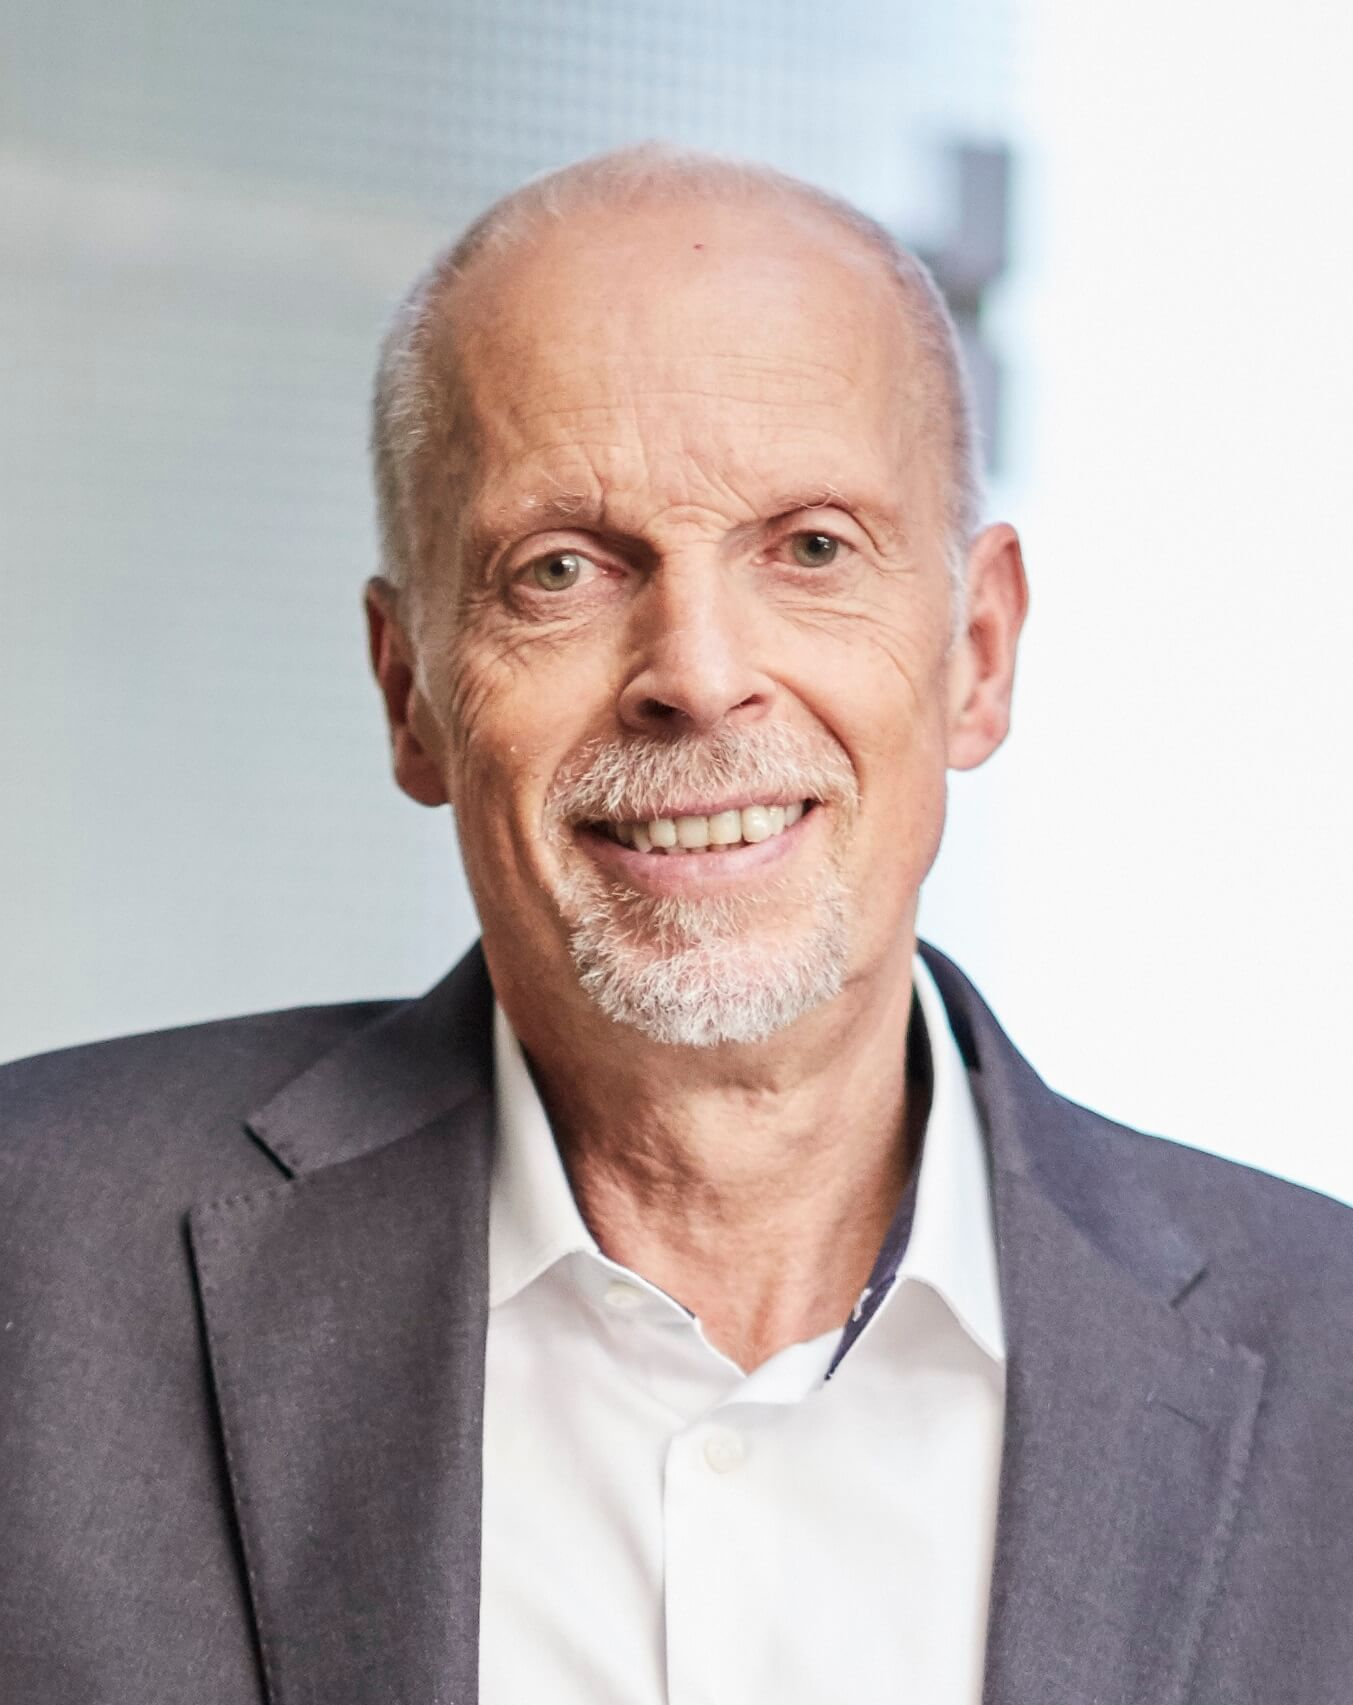 Hans Georg Häusel